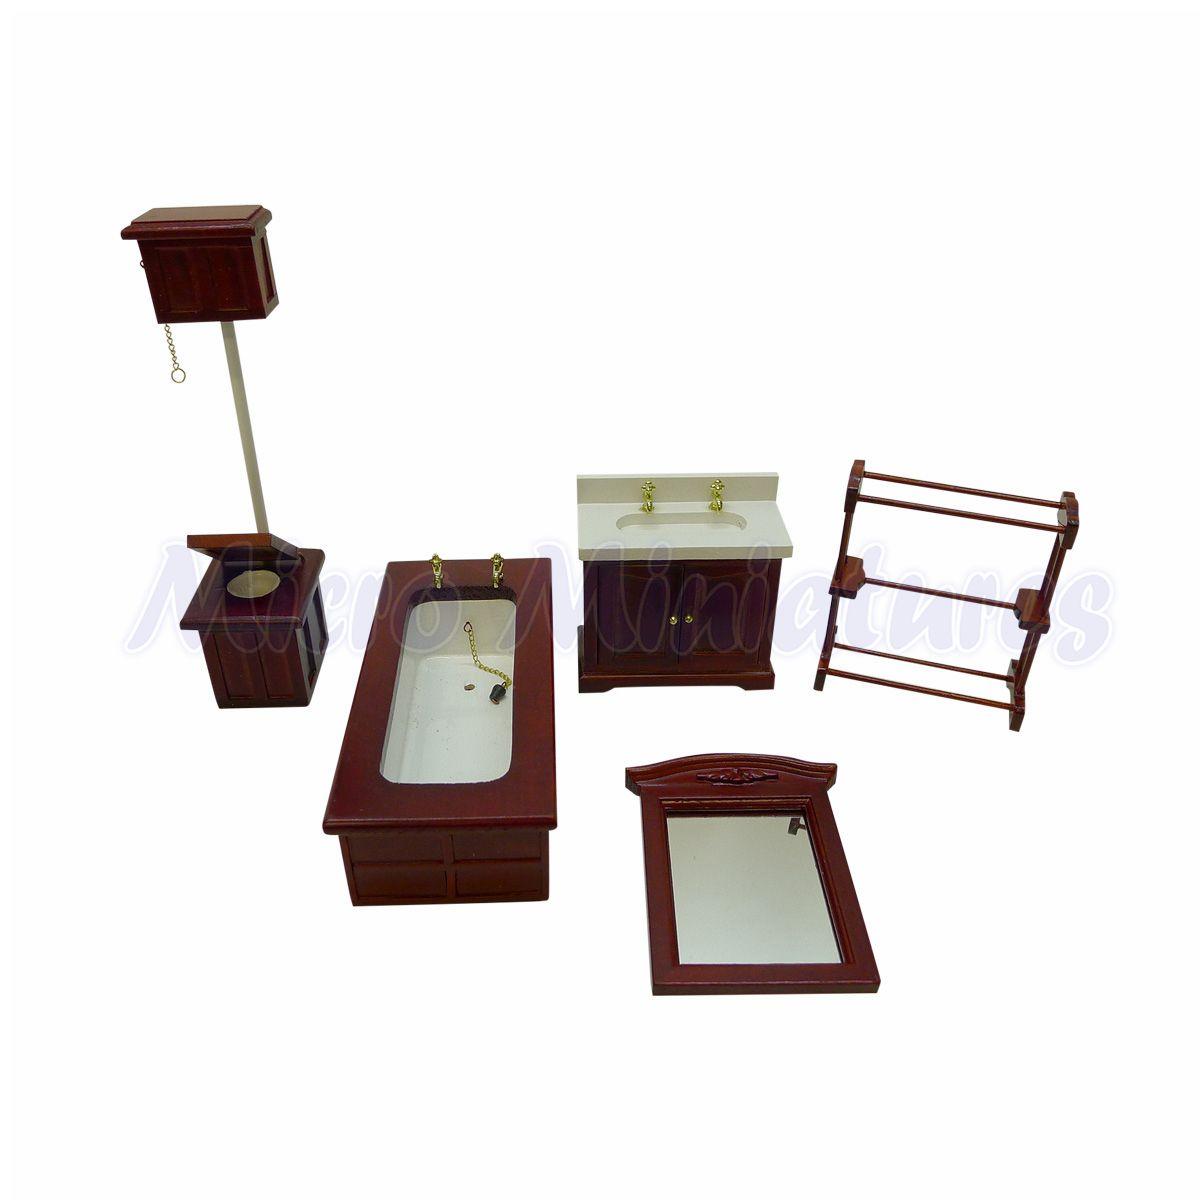 Mahogany Dolls House Bathroom Set 1/12th Scale - Micro Miniatures